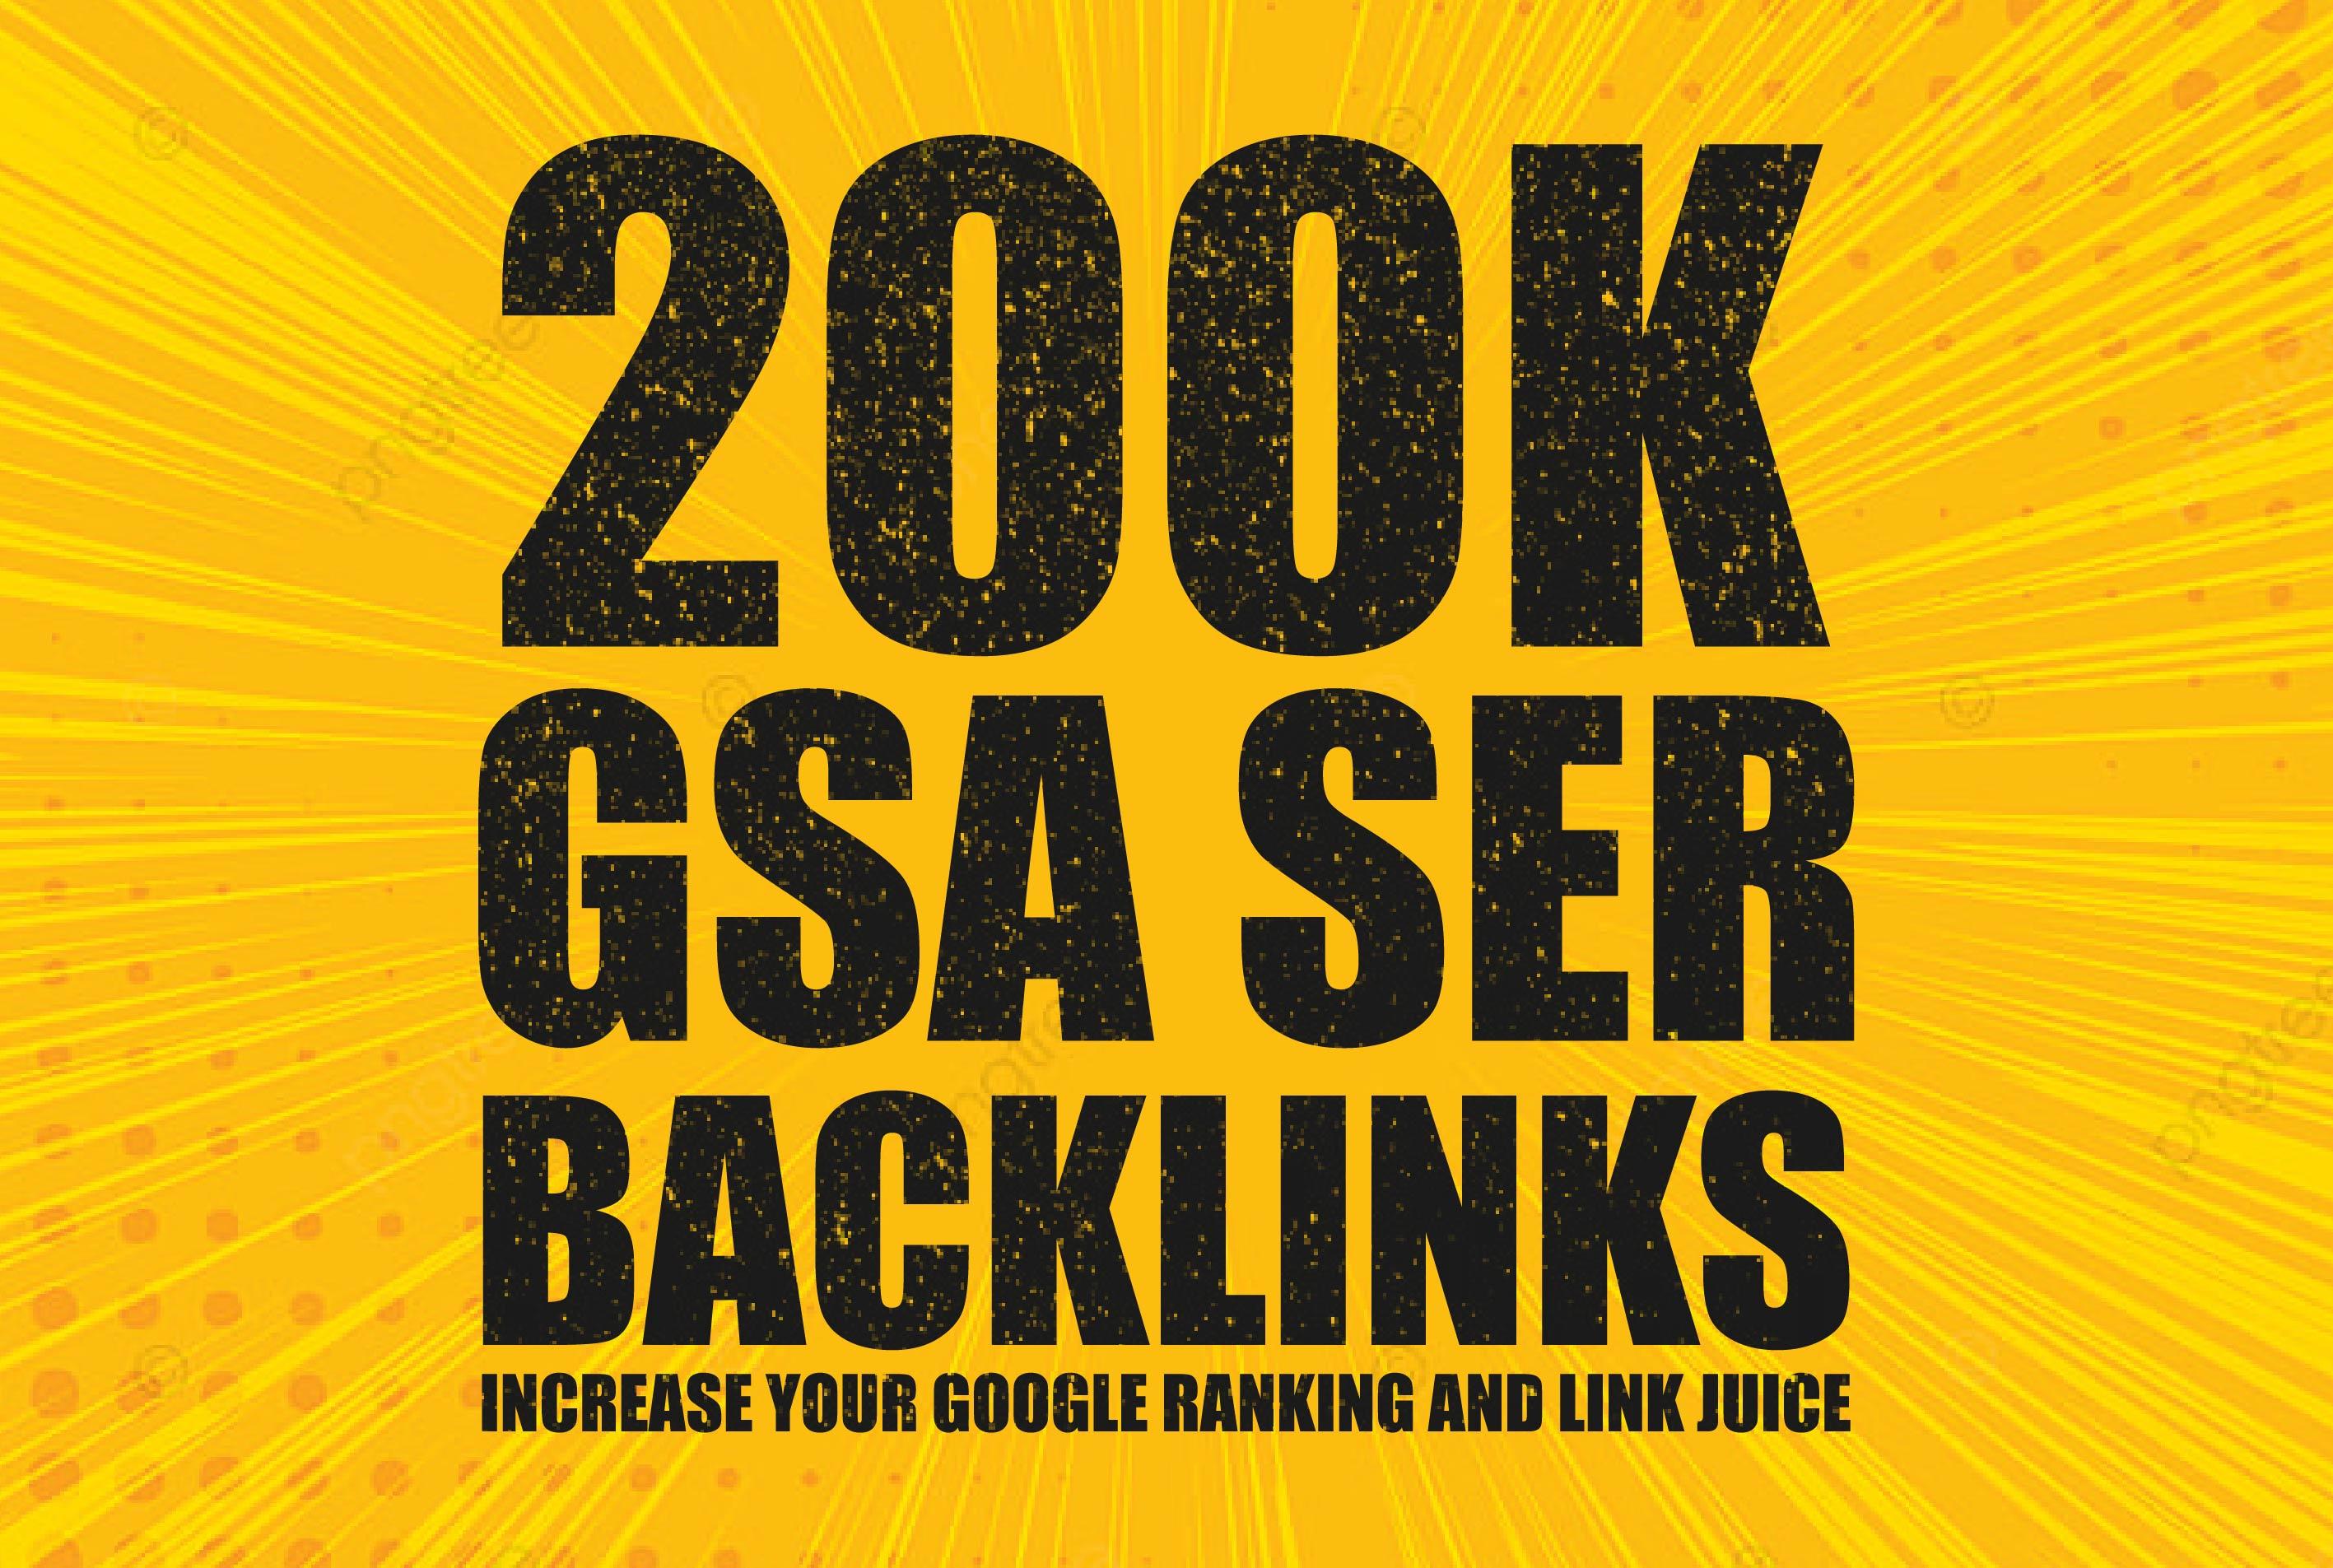 I will provide 200k Backlinks for your google ranking